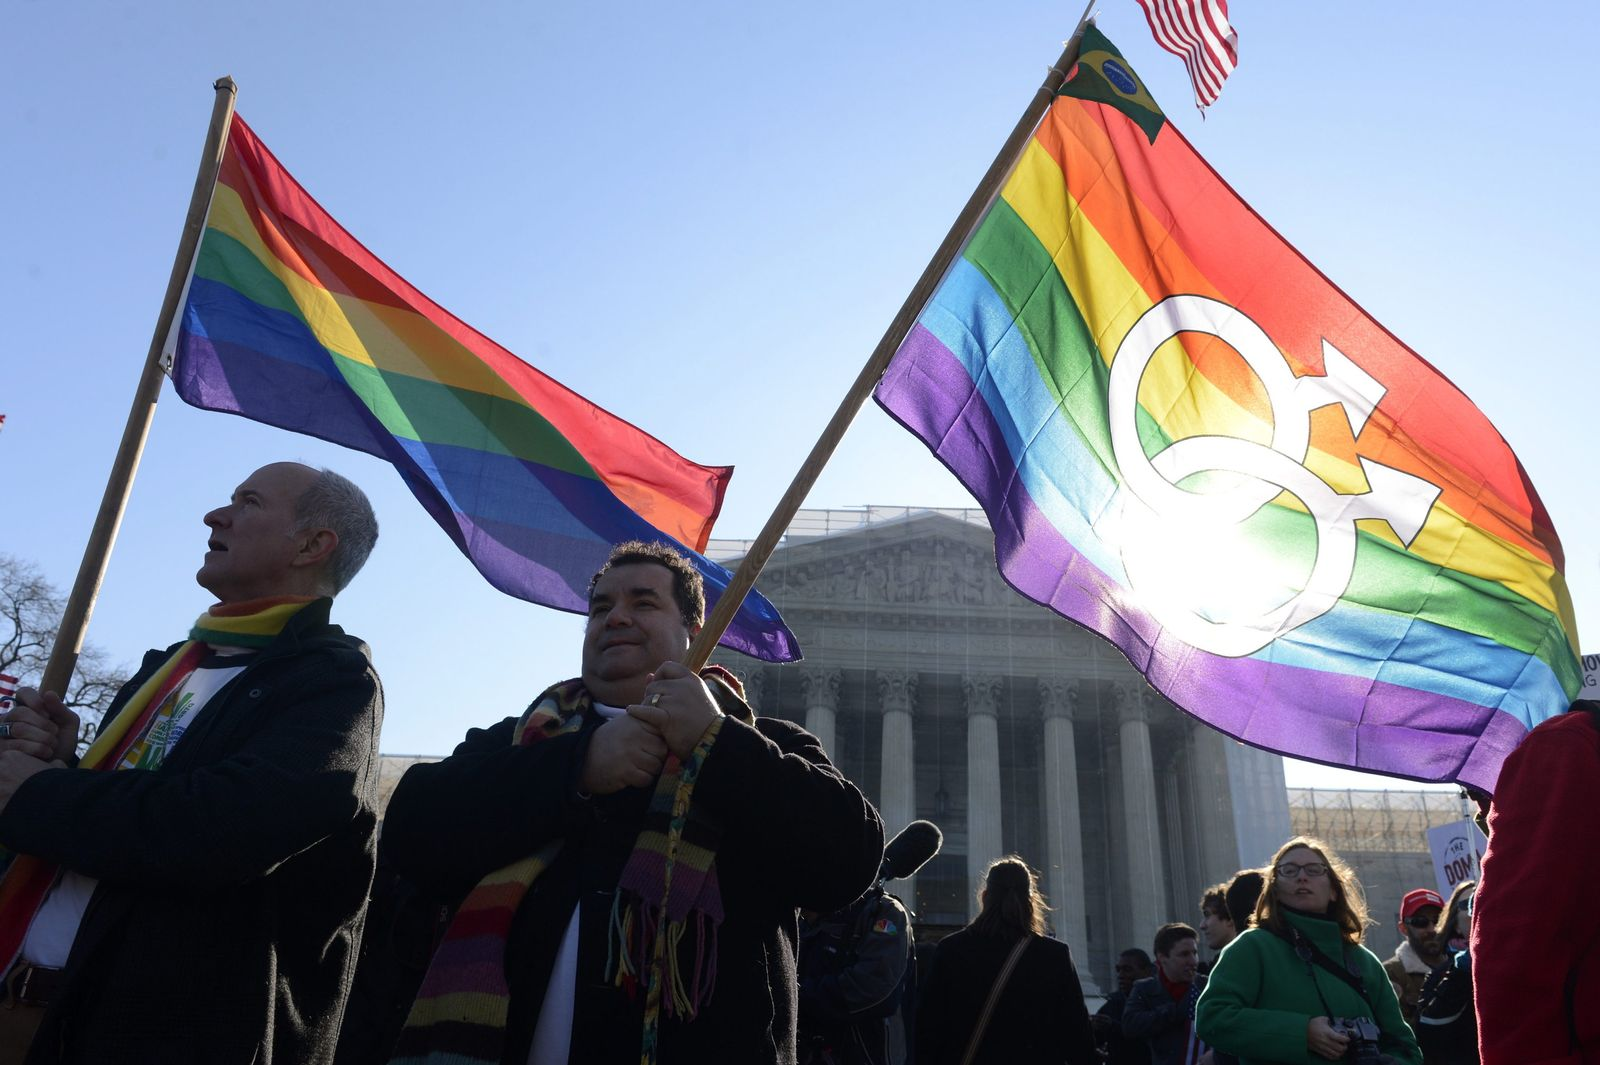 USA / Homo-Ehe